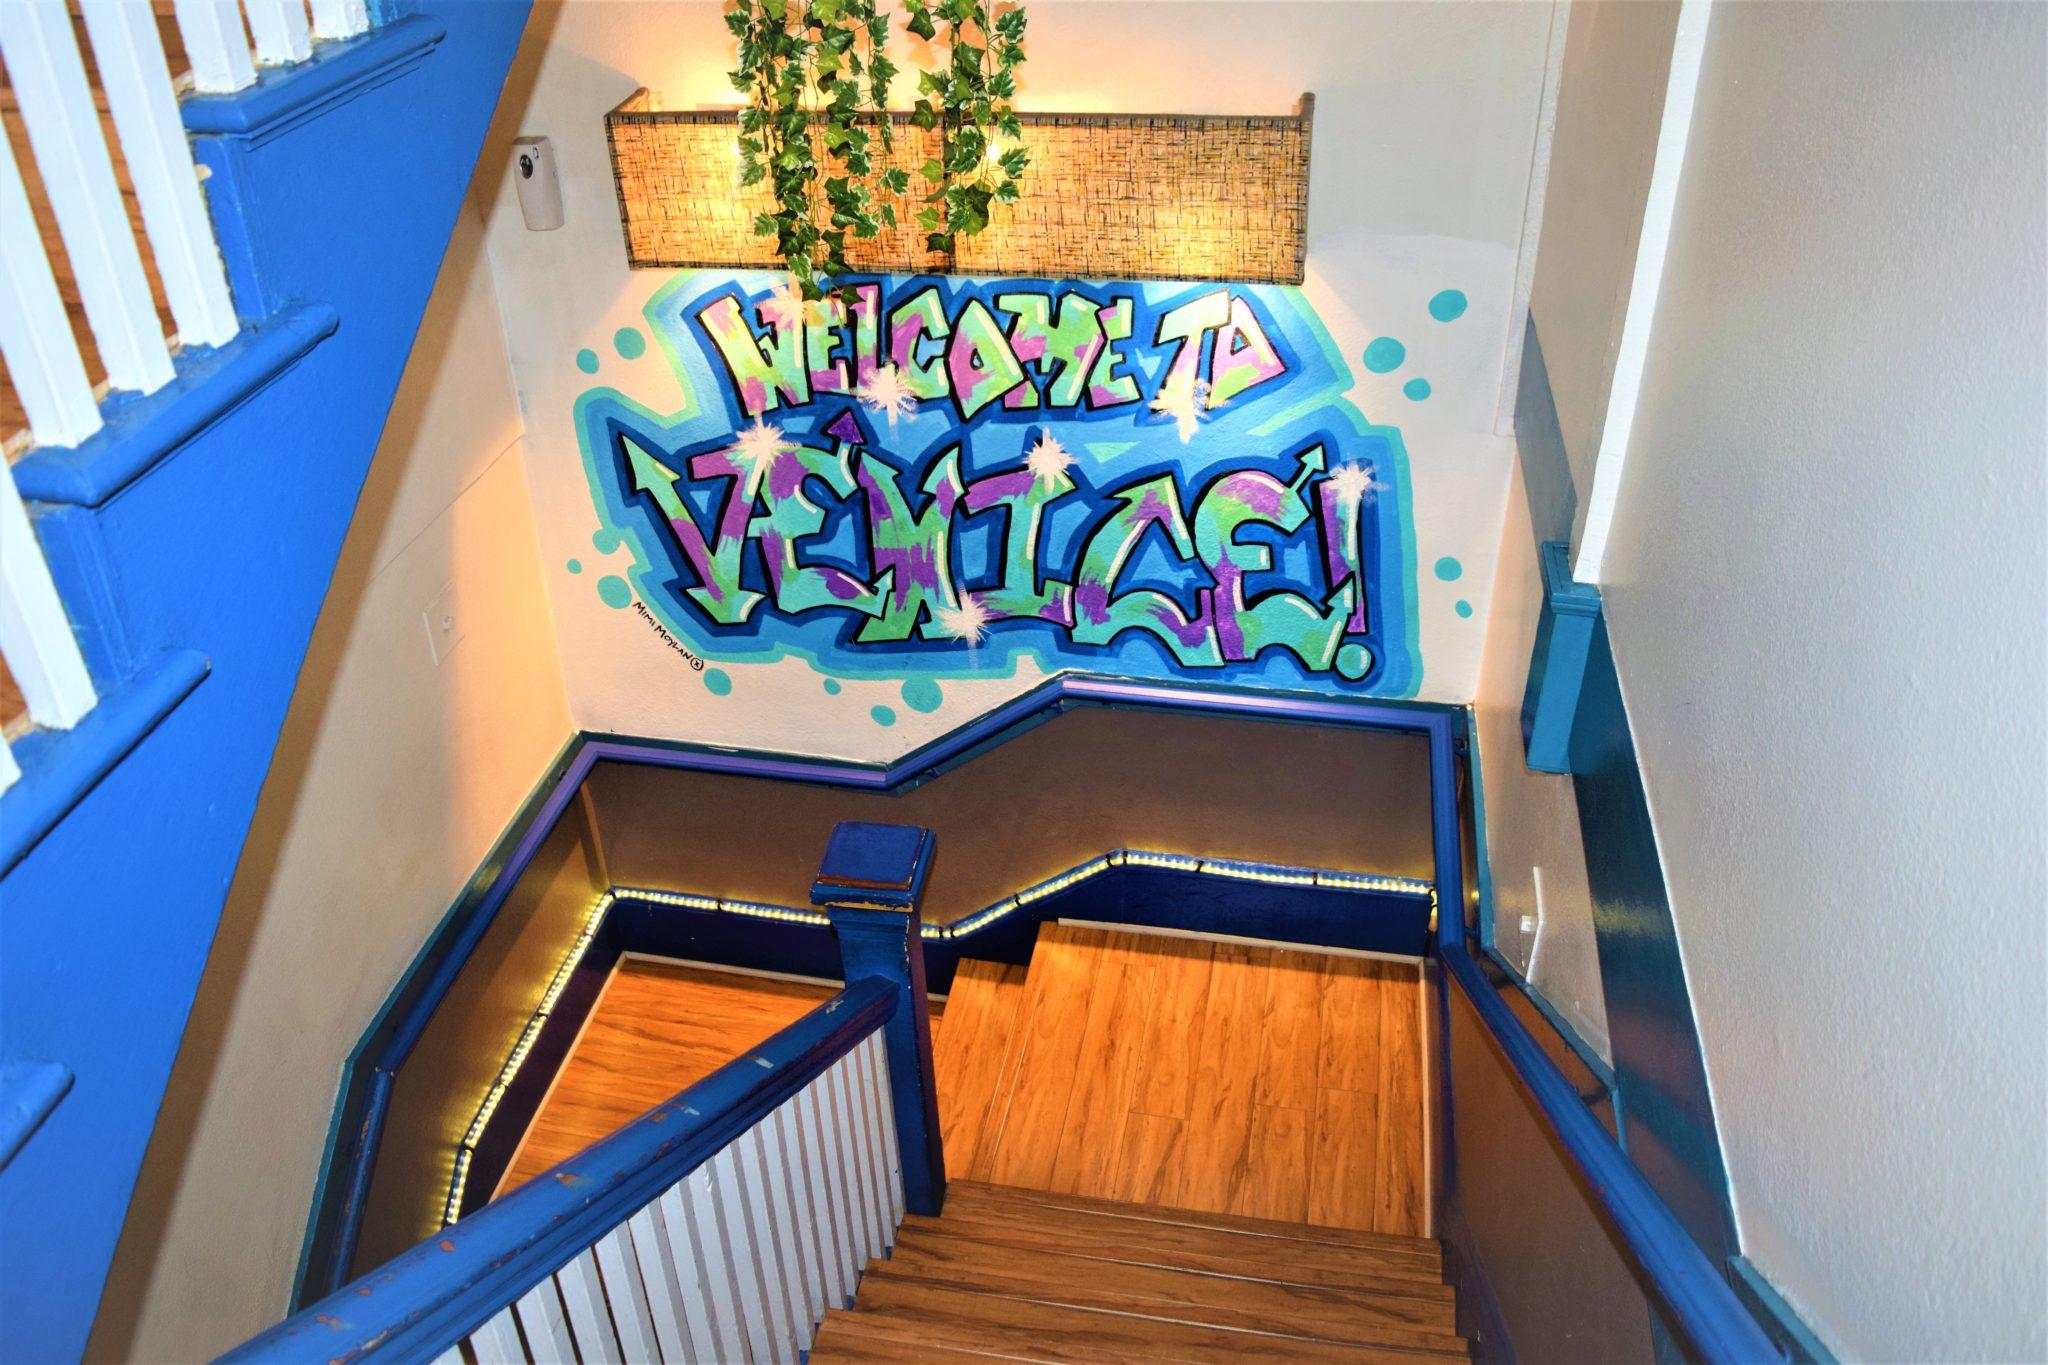 Stairs Venice Beach Samesun Hostel, Los Angeles, California